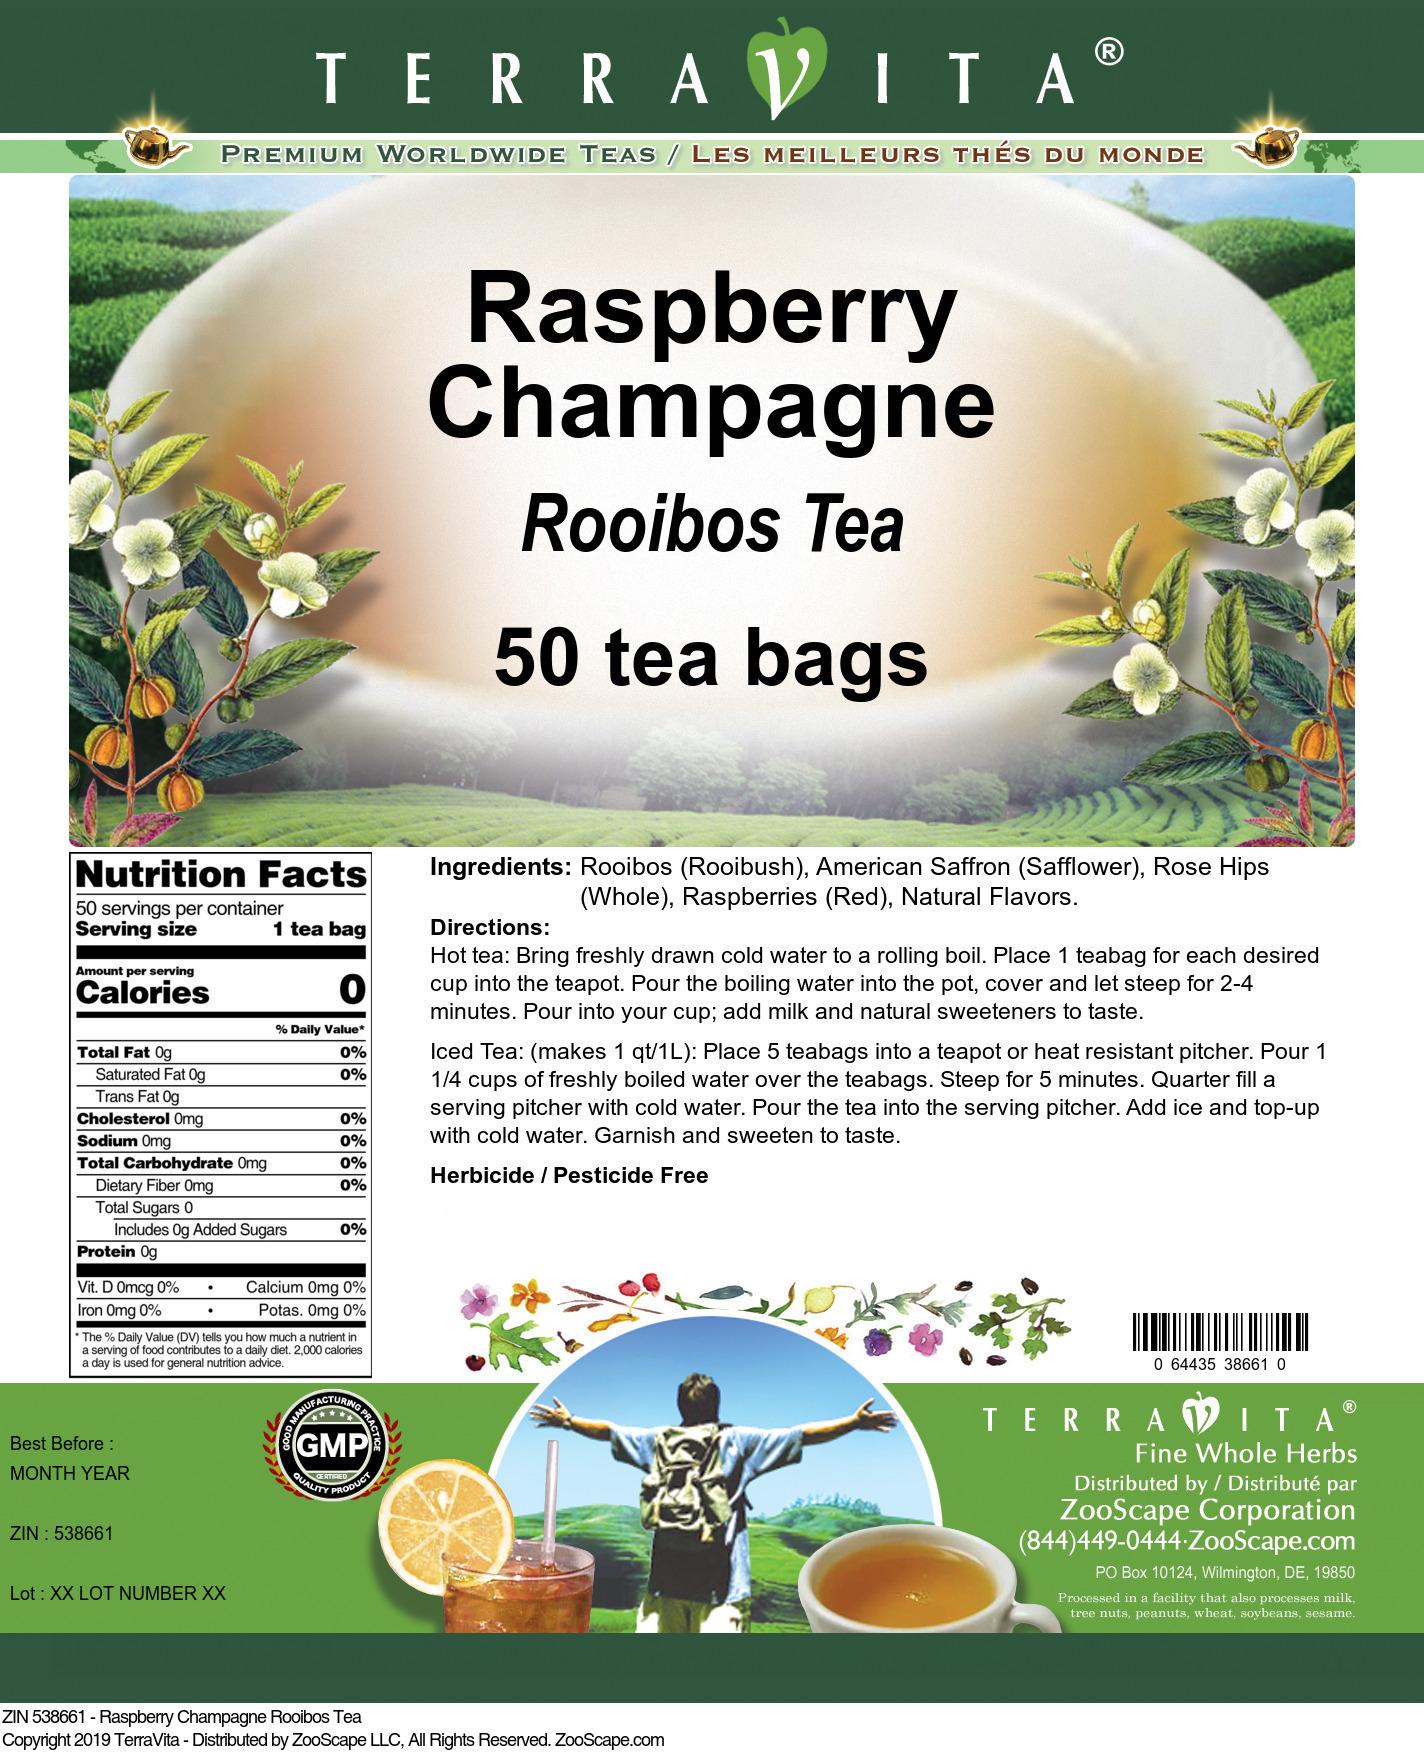 Raspberry Champagne Rooibos Tea